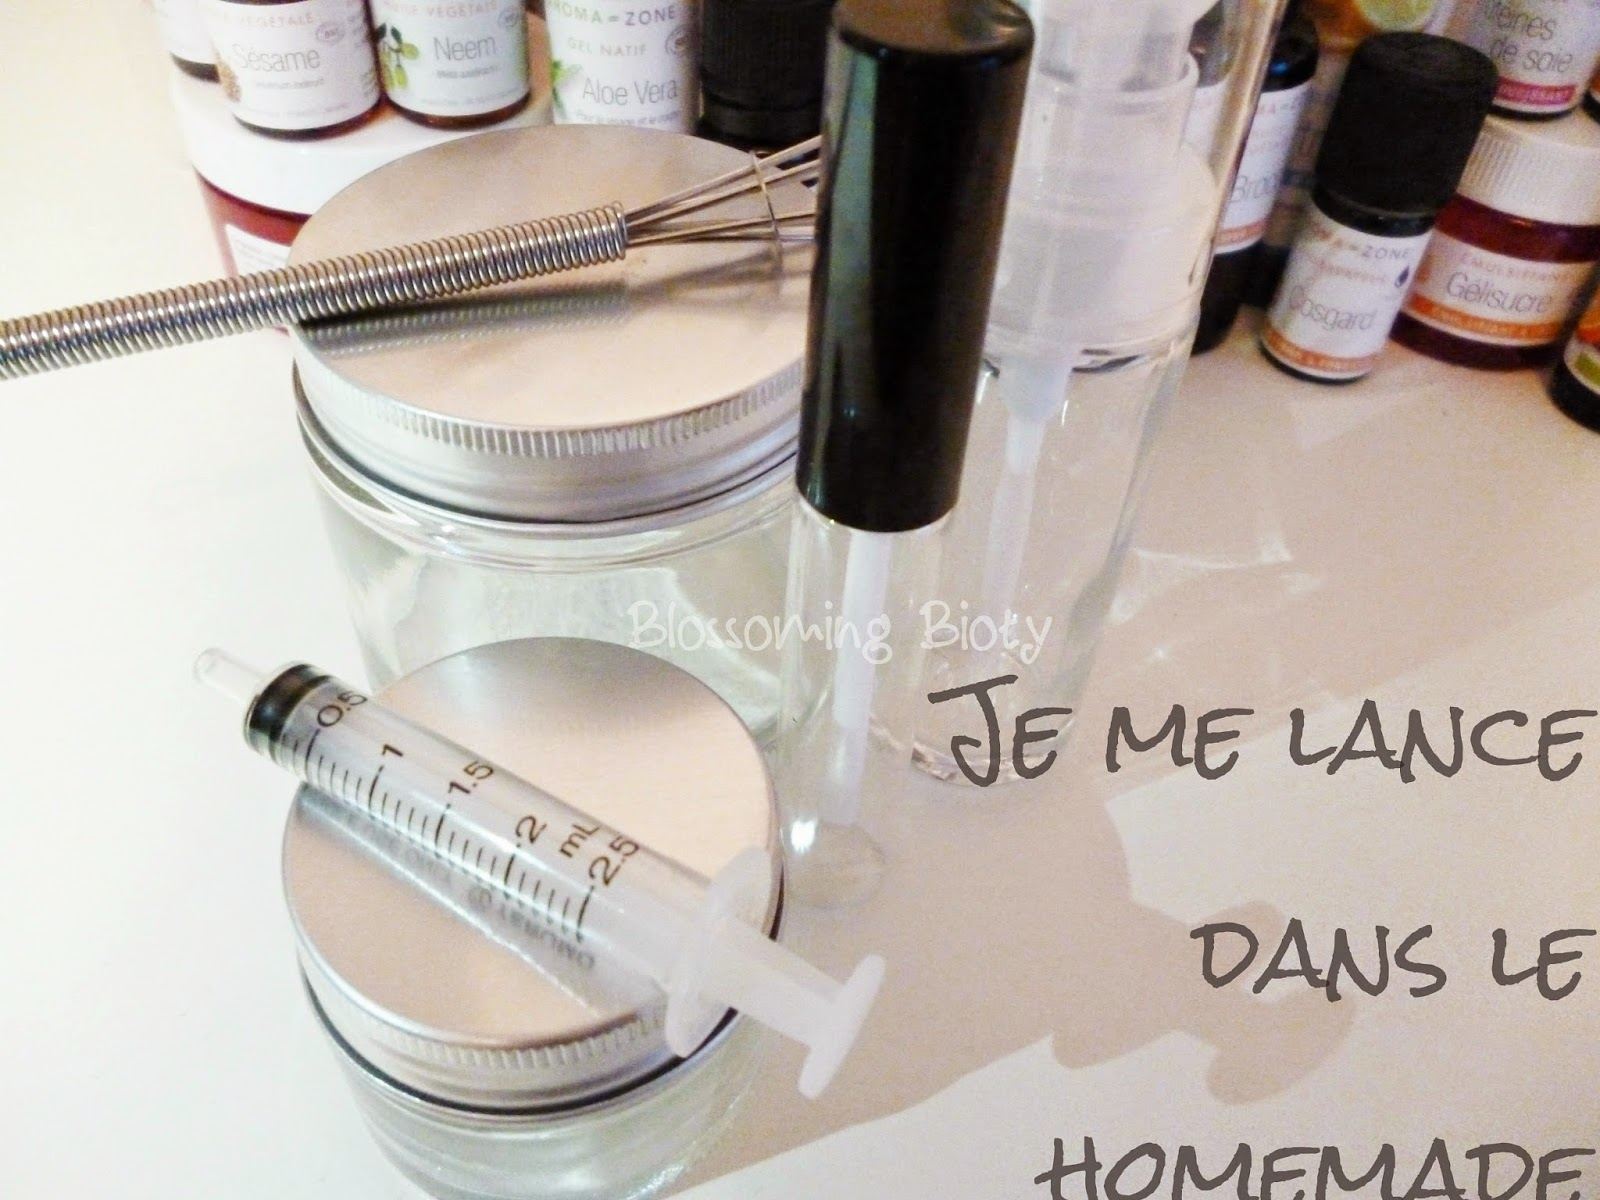 http://blossomingbioty.blogspot.com/2015/03/cosmetiques-je-me-lance-dans-le-homemade.html